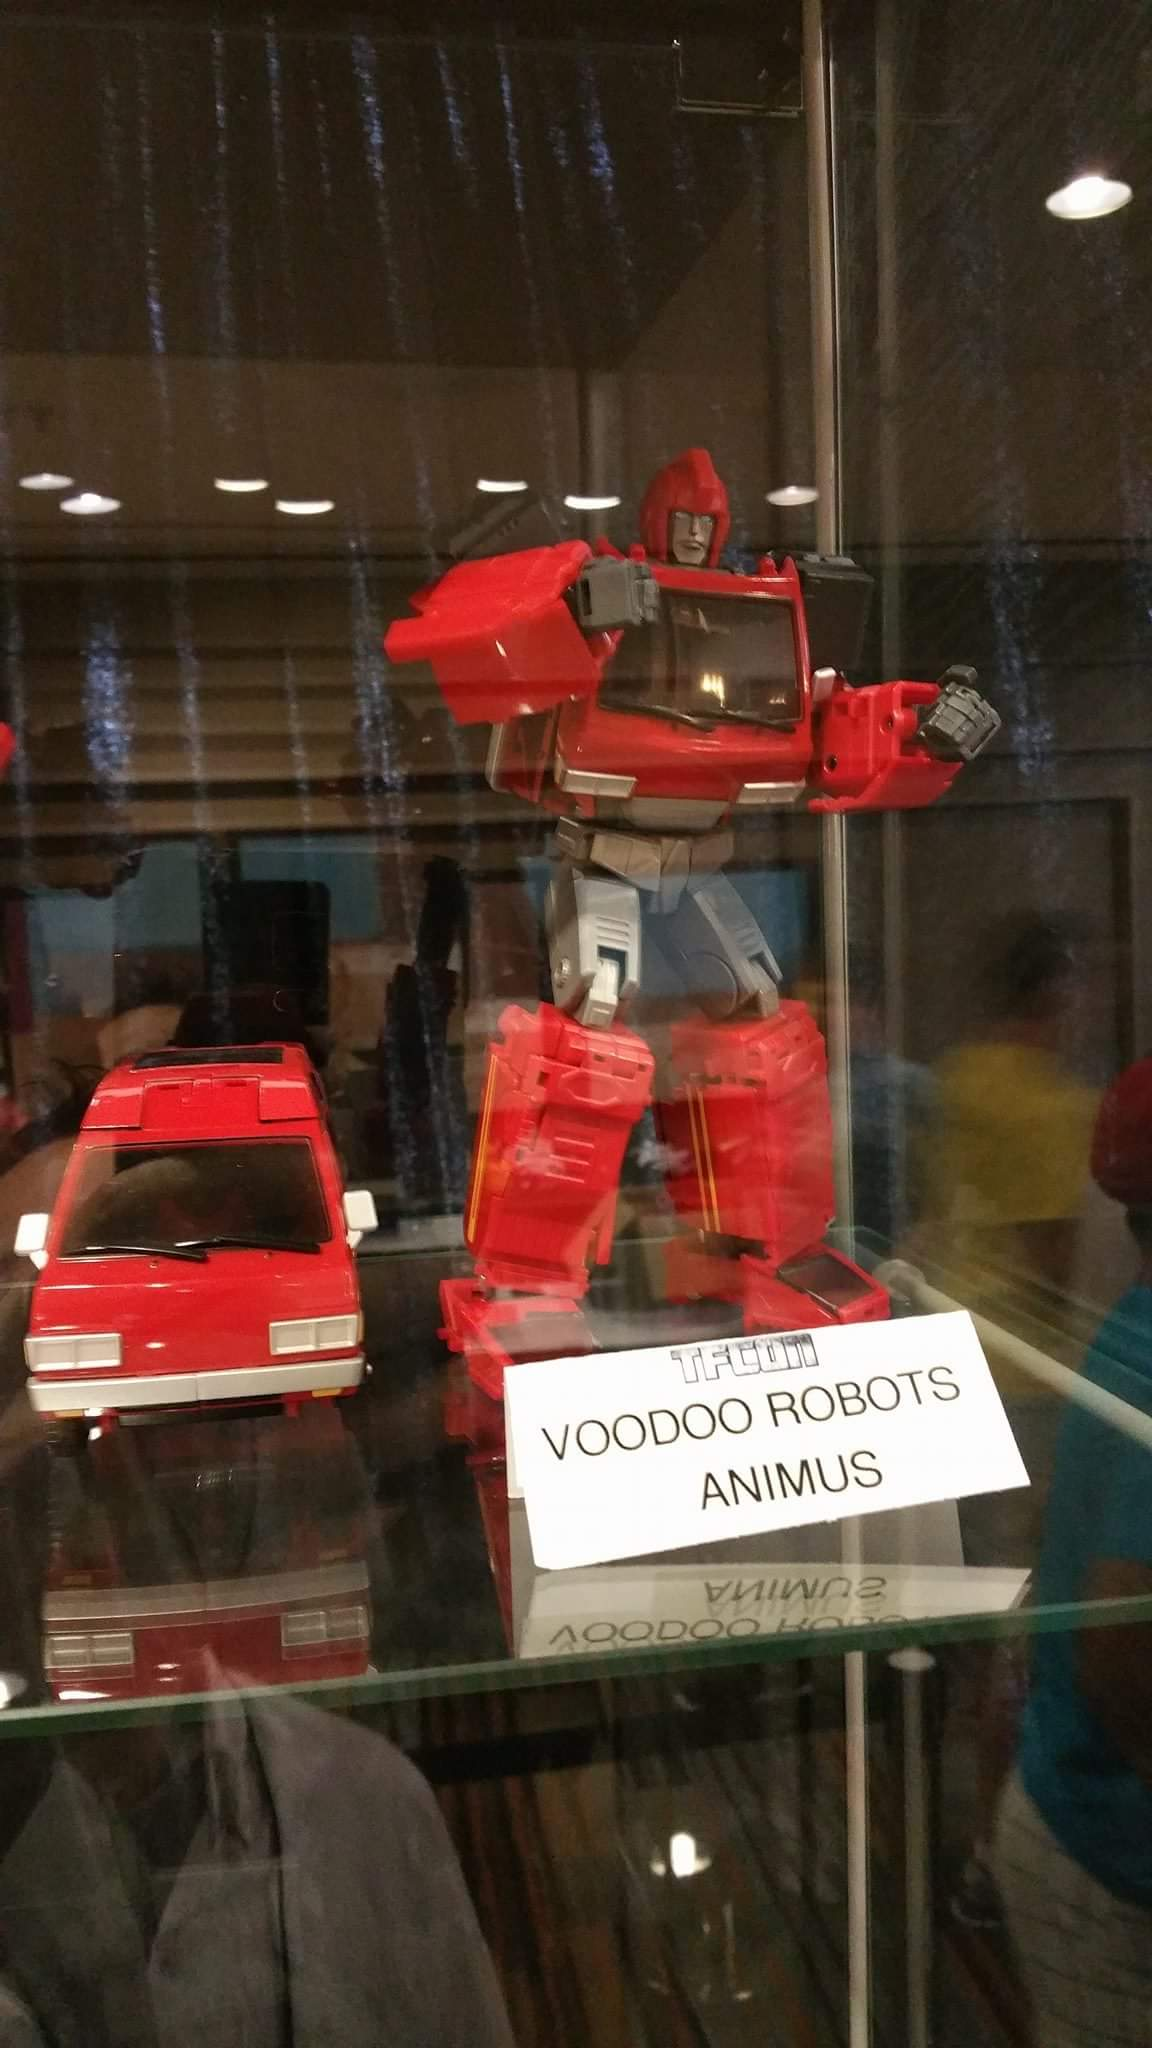 [Voodoo Robots] Produit Tiers - Salus (aka Ratchet/Mécano) & Animus (aka Ironhide/Rhino) - Page 3 89N0u9LV